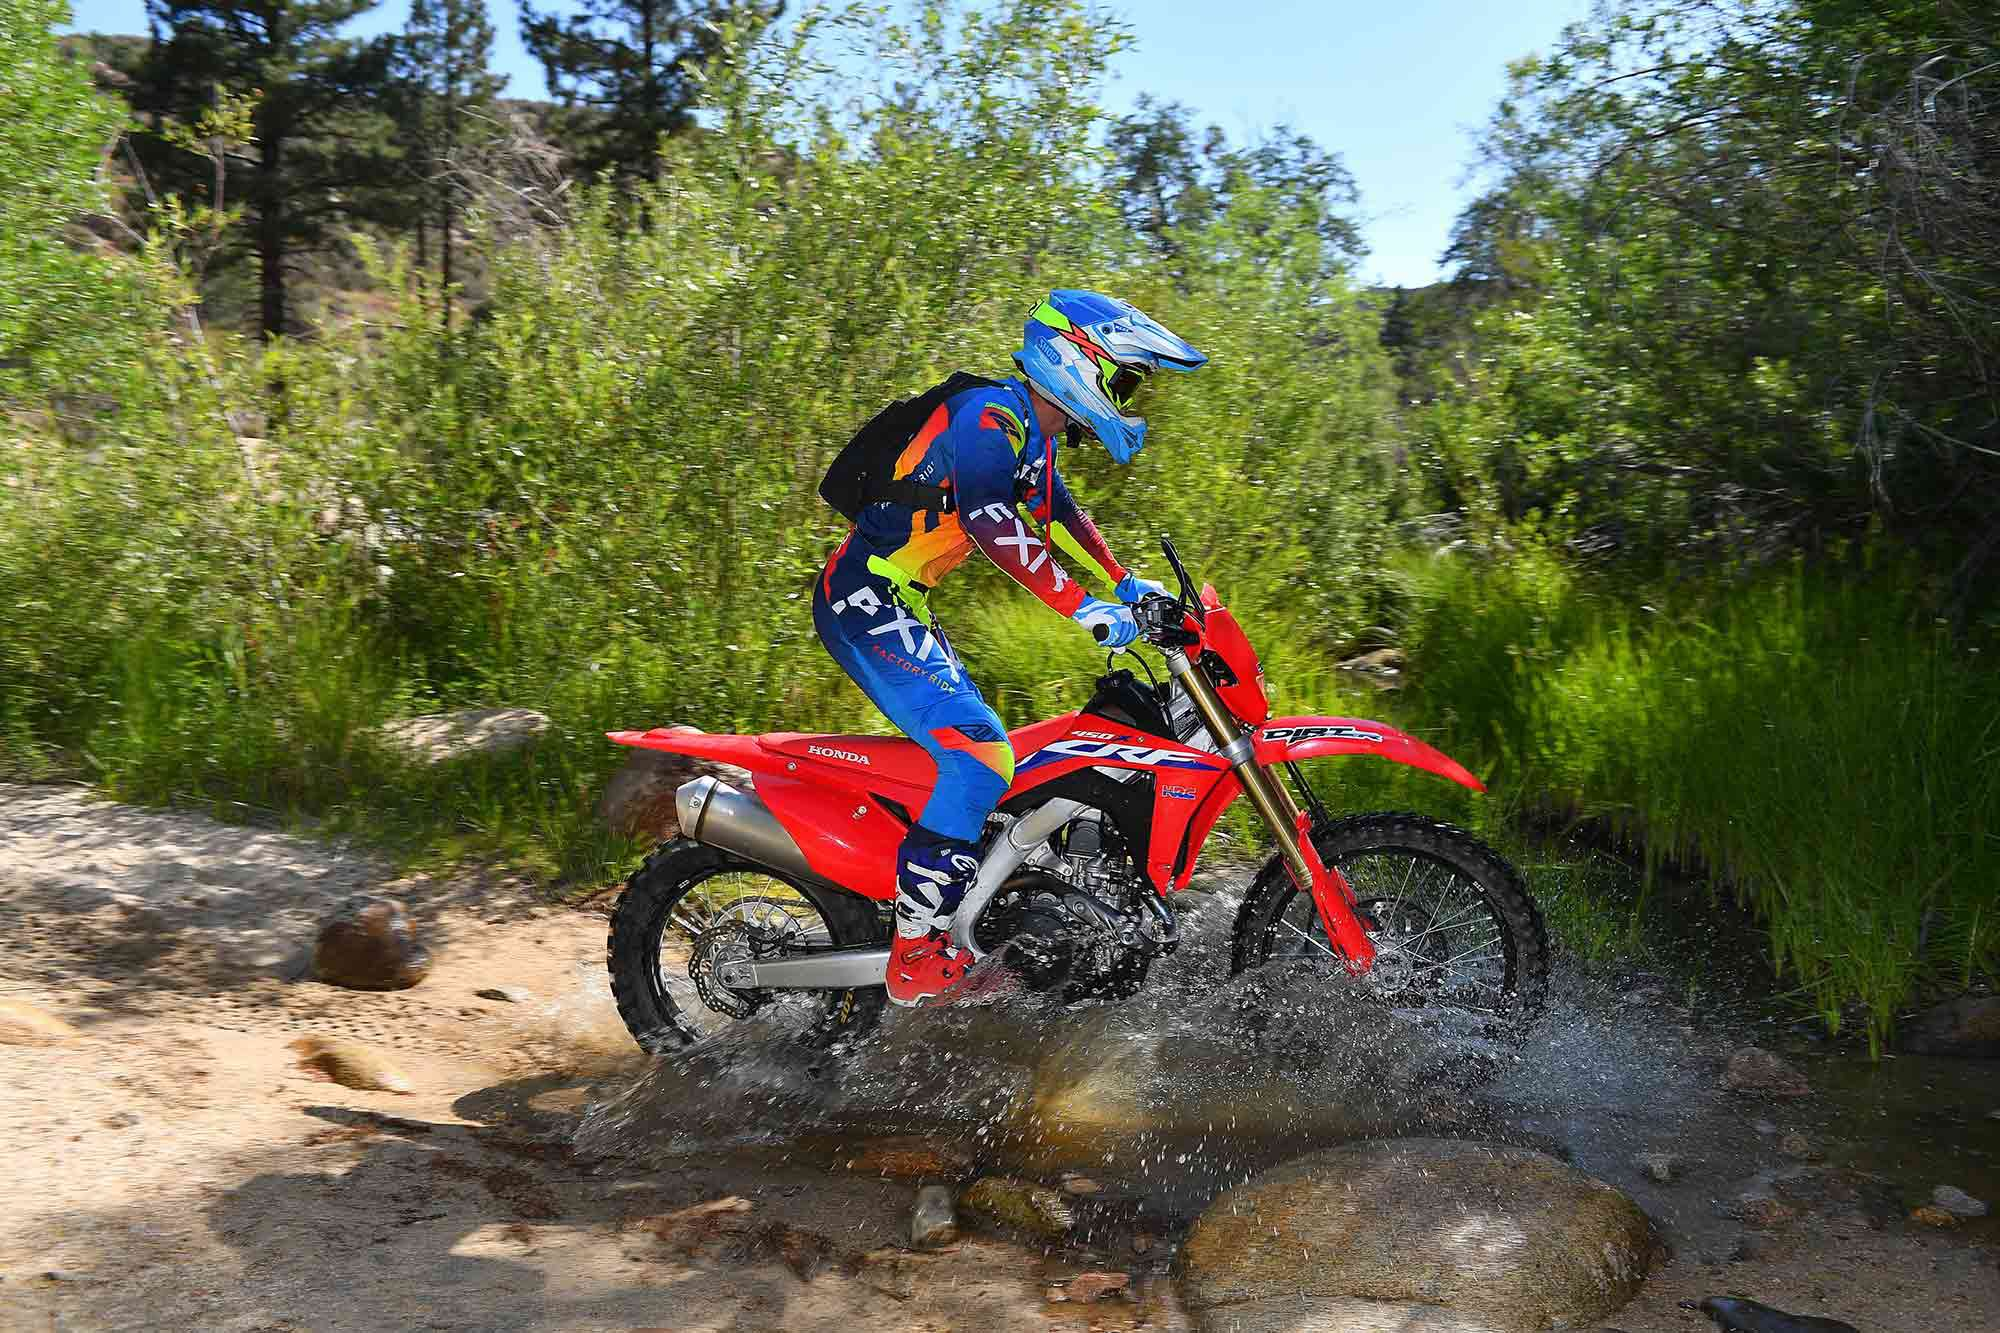 2021 Honda CRF450X Review